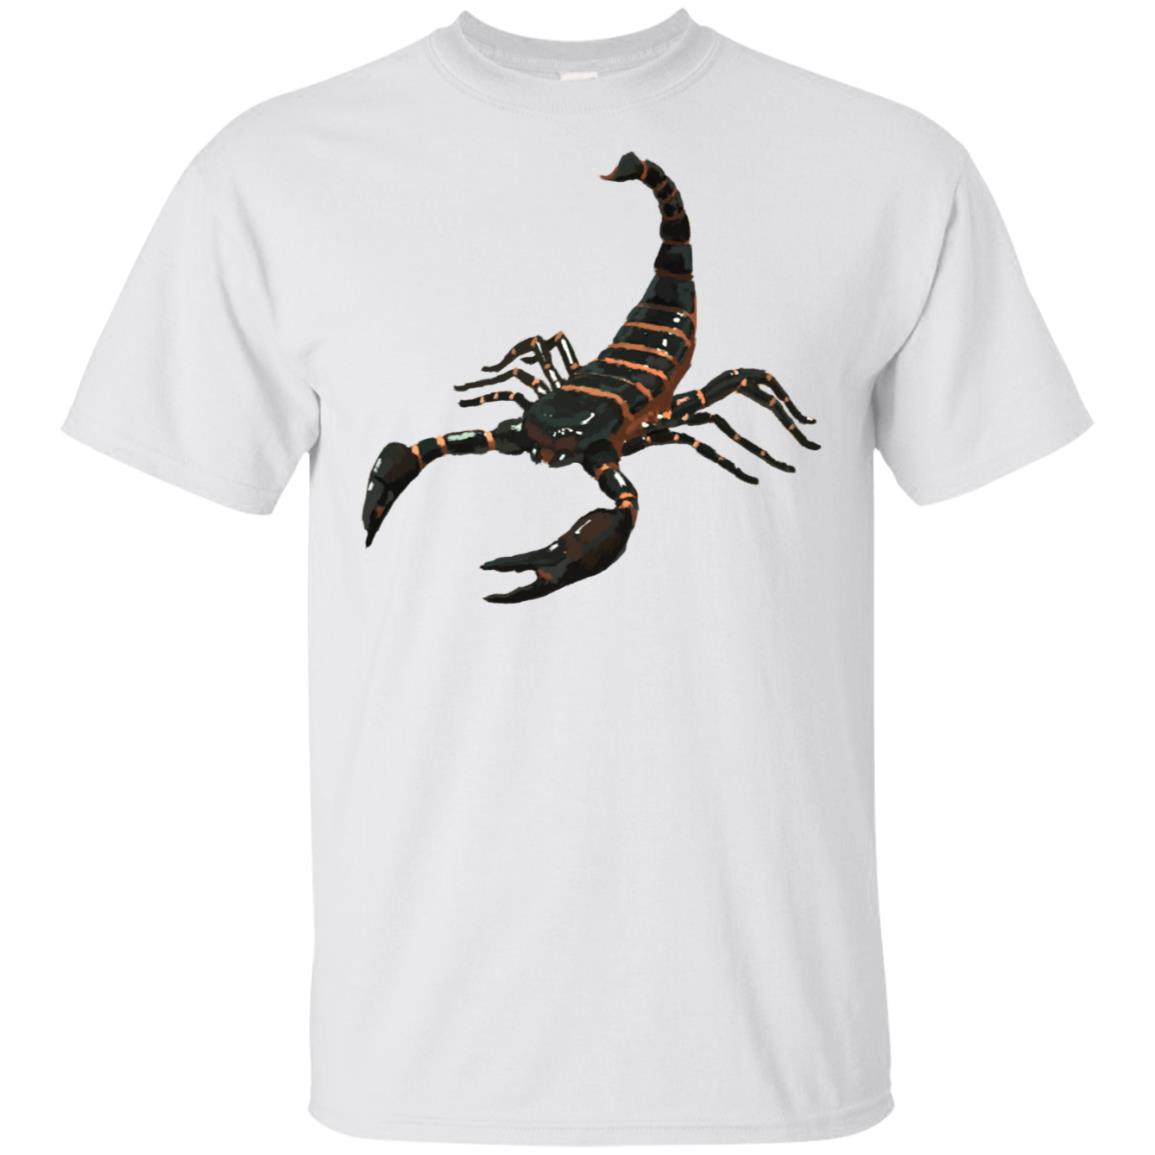 Scorpion Unisex Short Sleeve